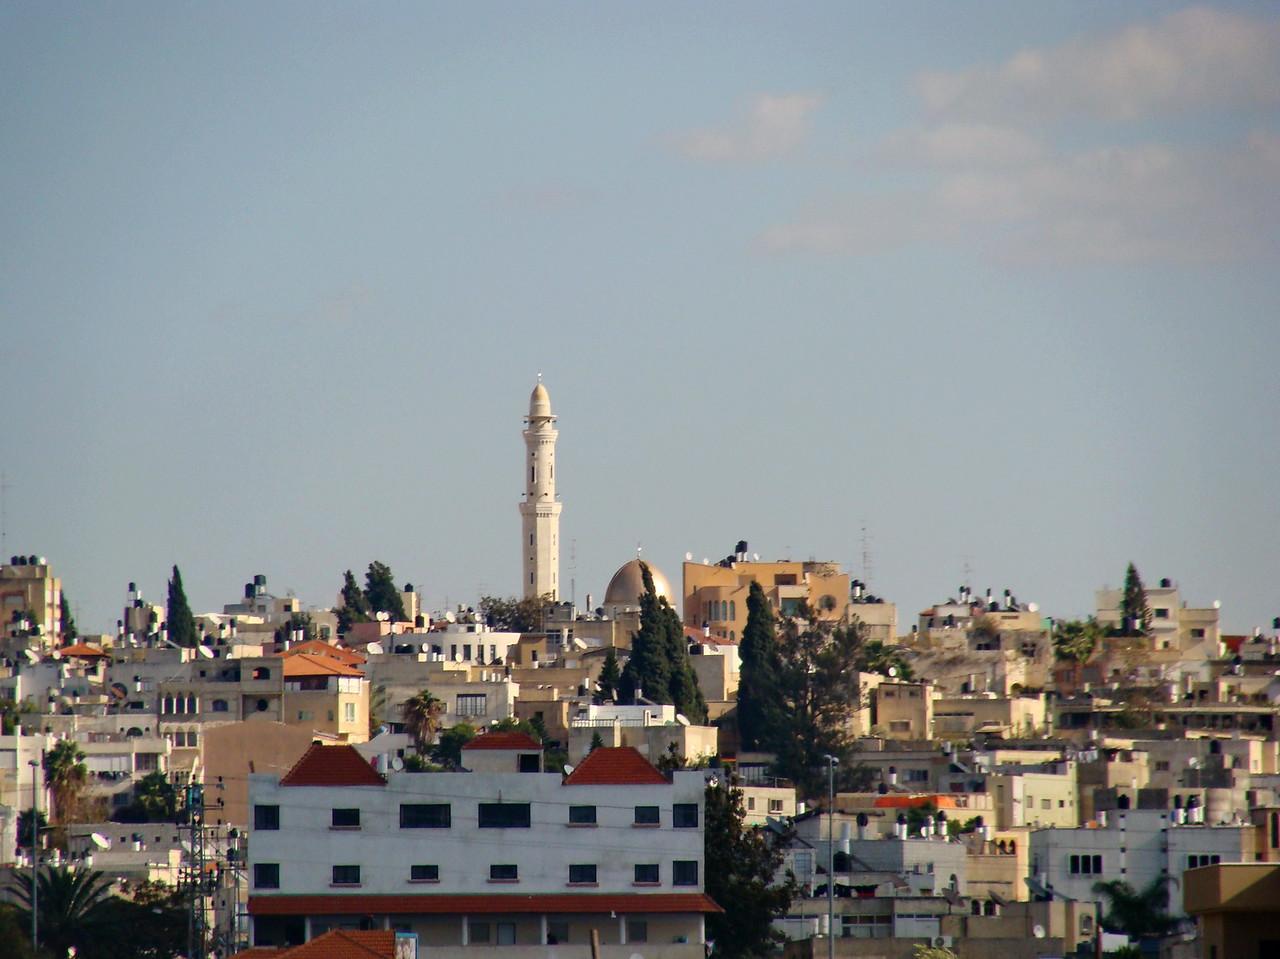 Palestinian City beyond the Wall